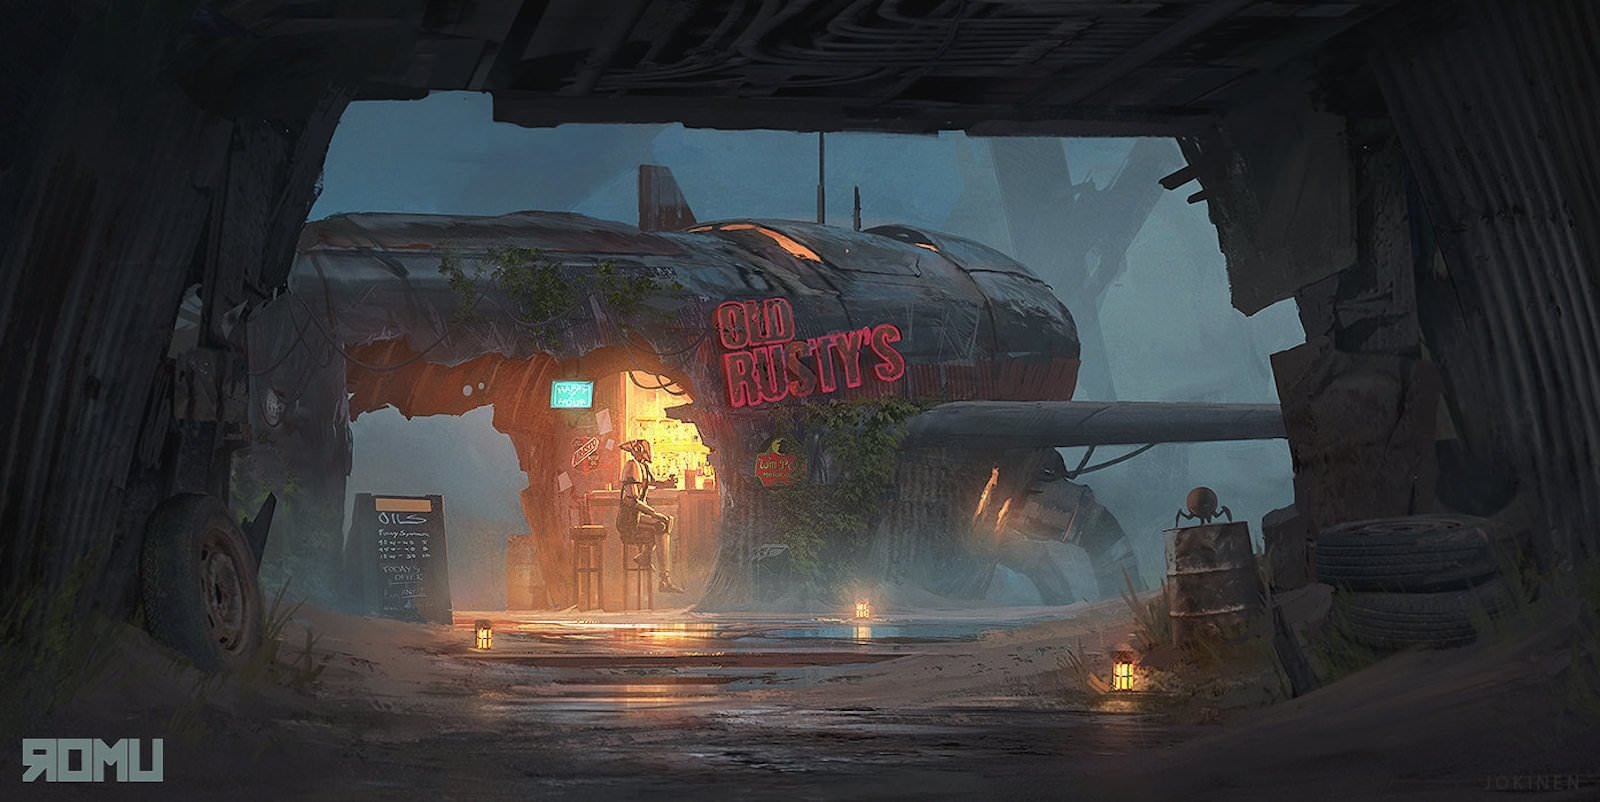 Old Rusty's Bar искусство, картины, рисунки, юхани йокинен